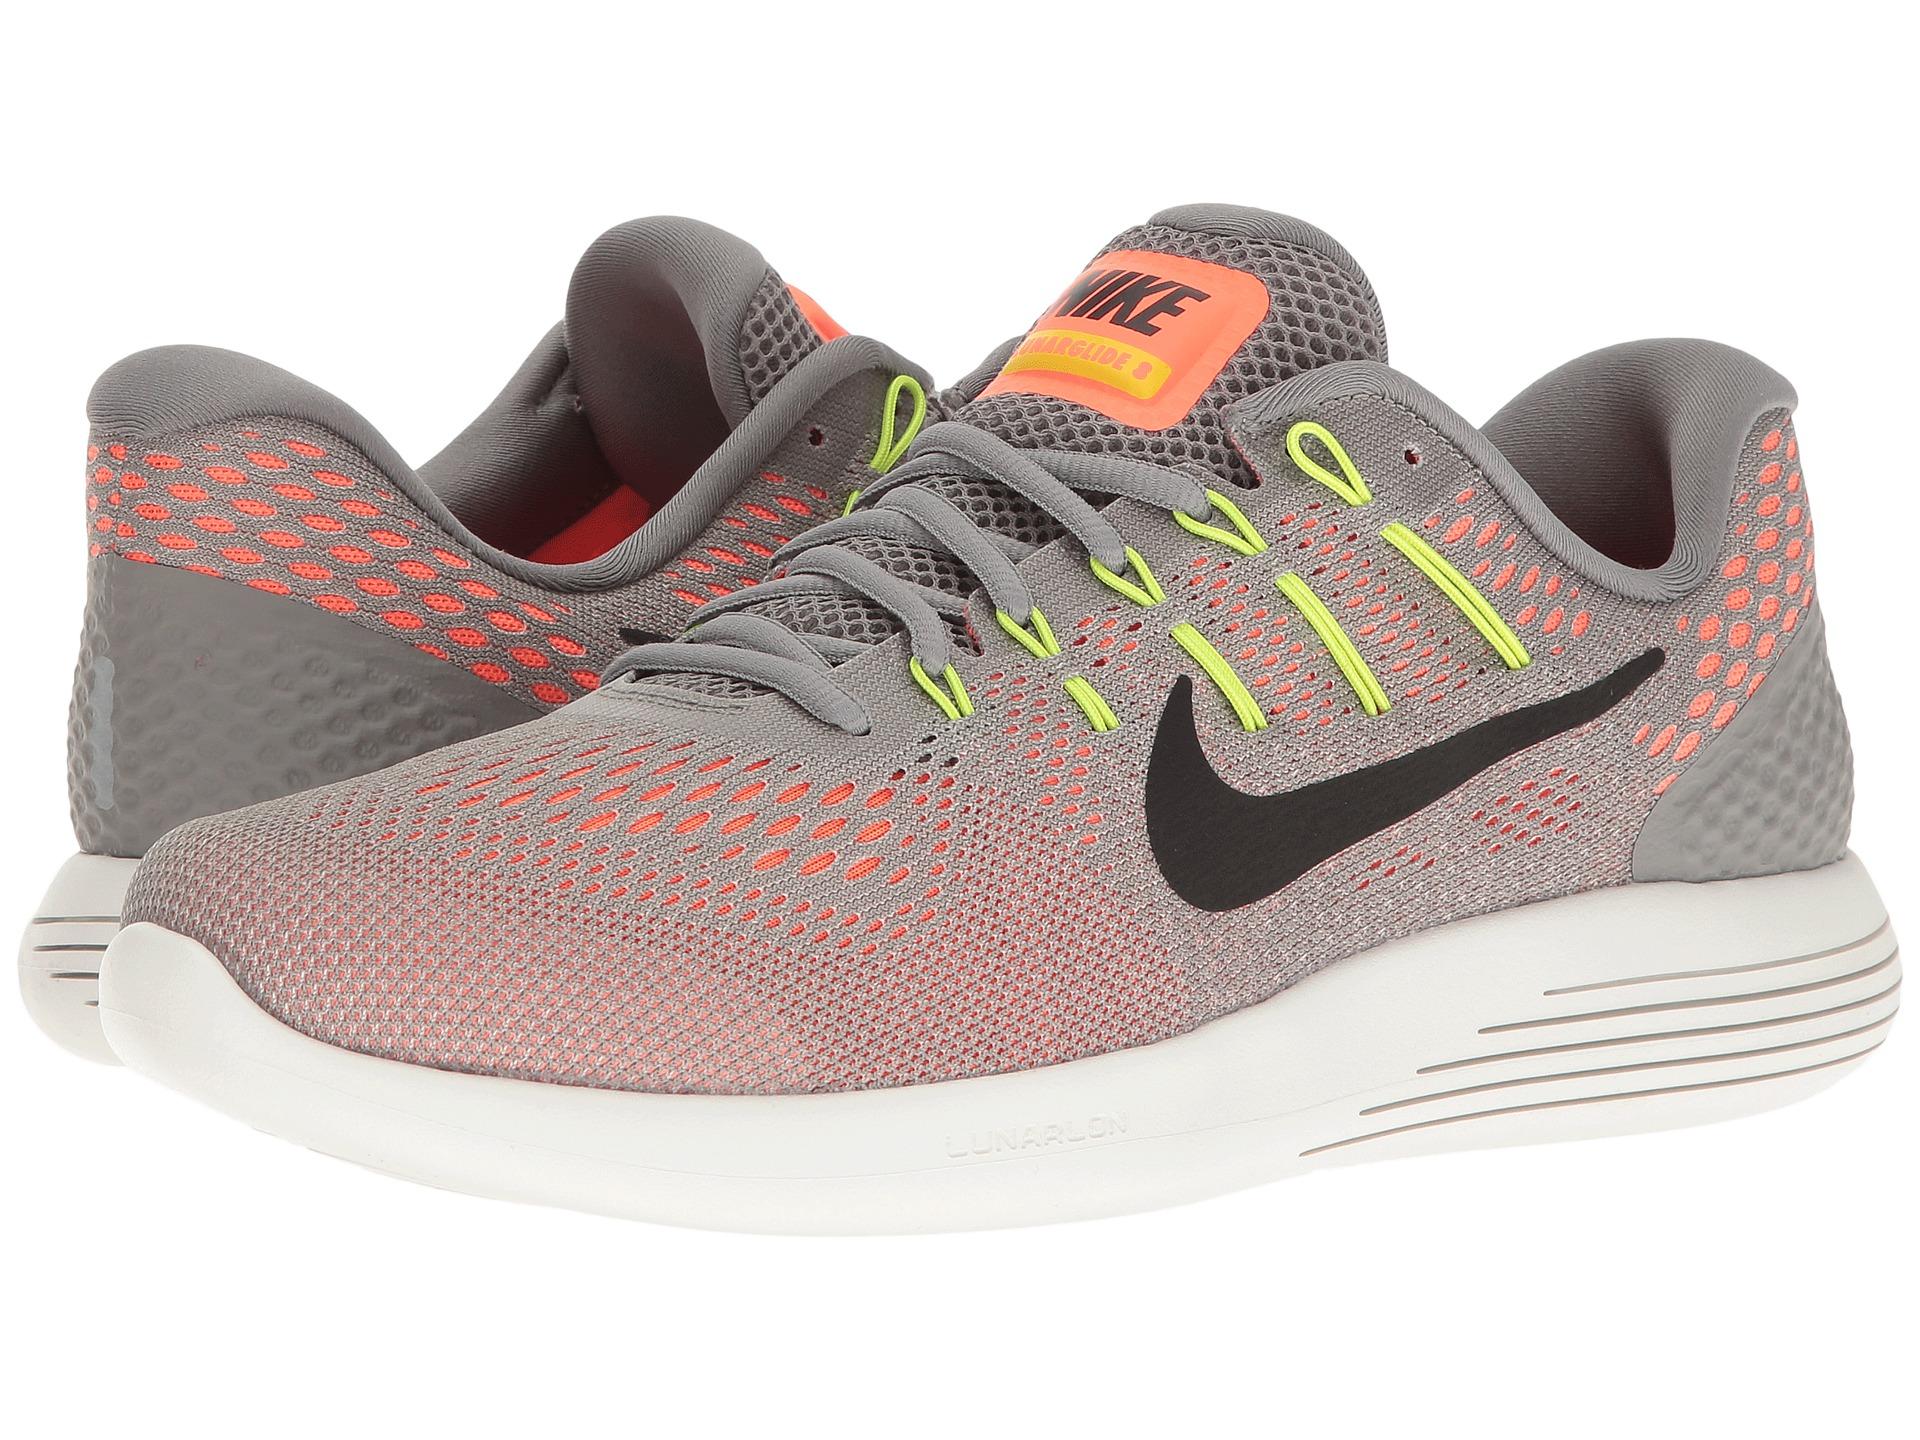 Nike Lunarglide  Running Shoes Reviews